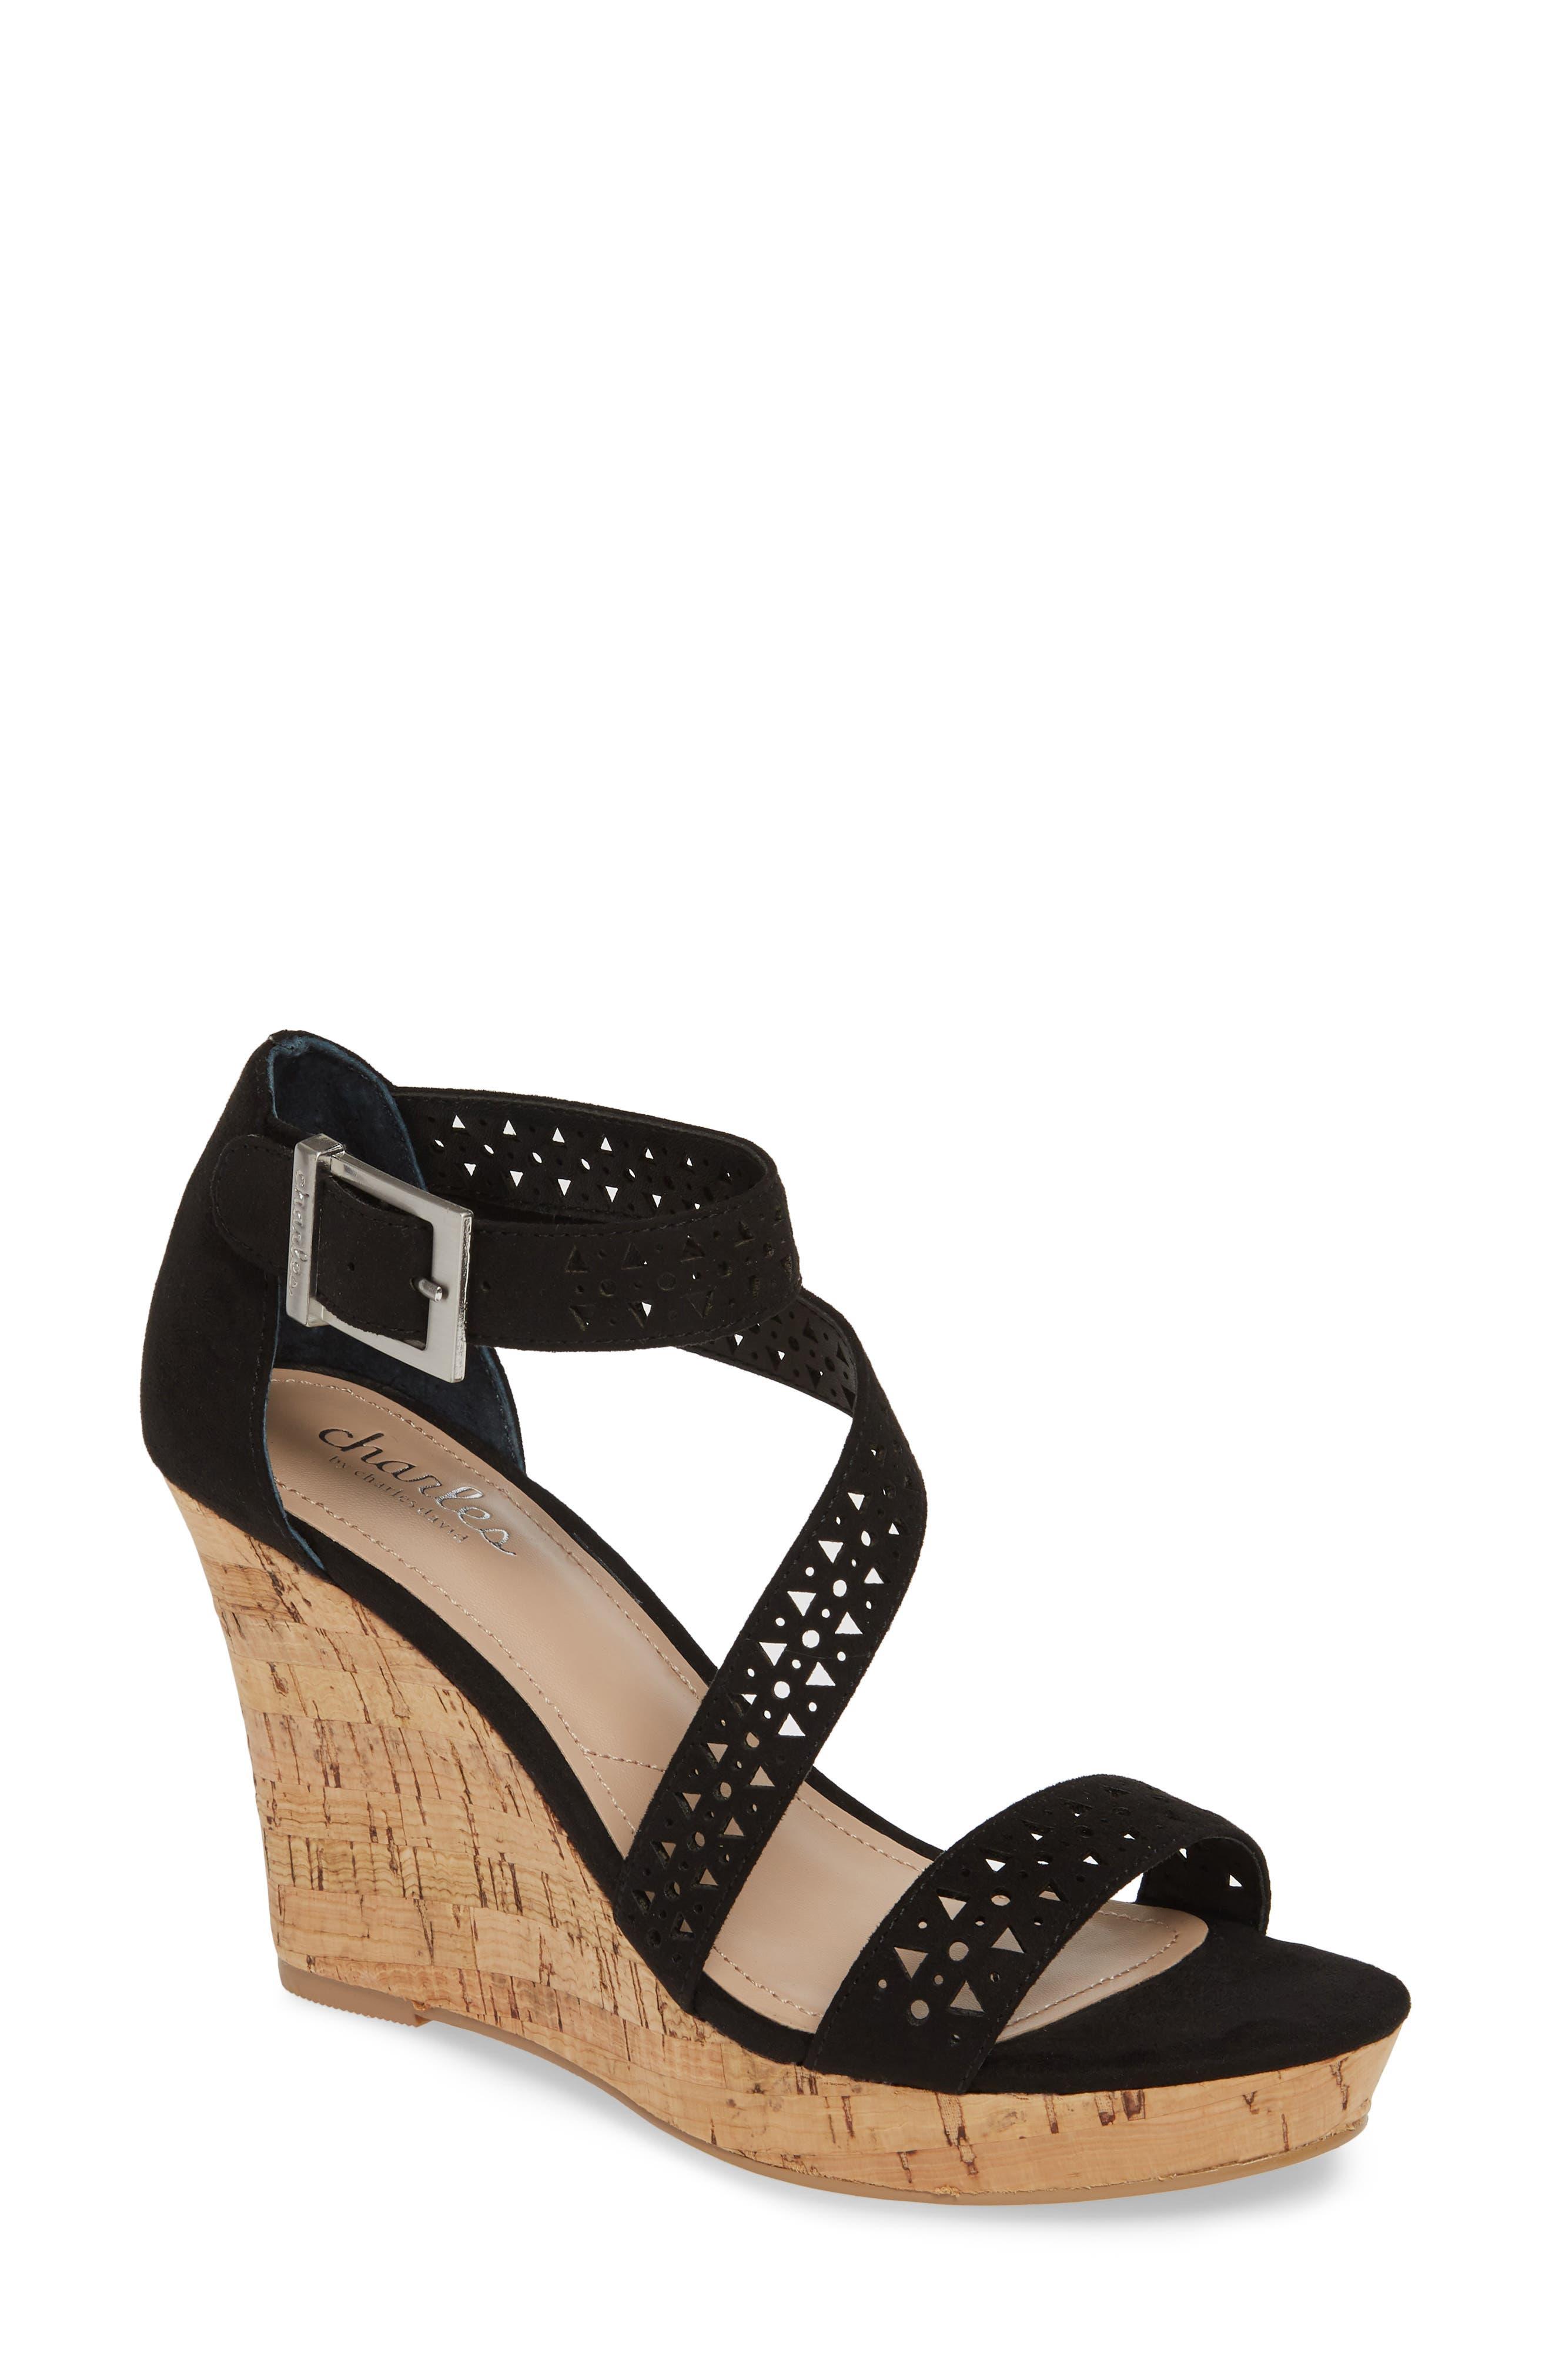 Landon Perforated Wedge Sandal,                             Main thumbnail 1, color,                             BLACK FABRIC